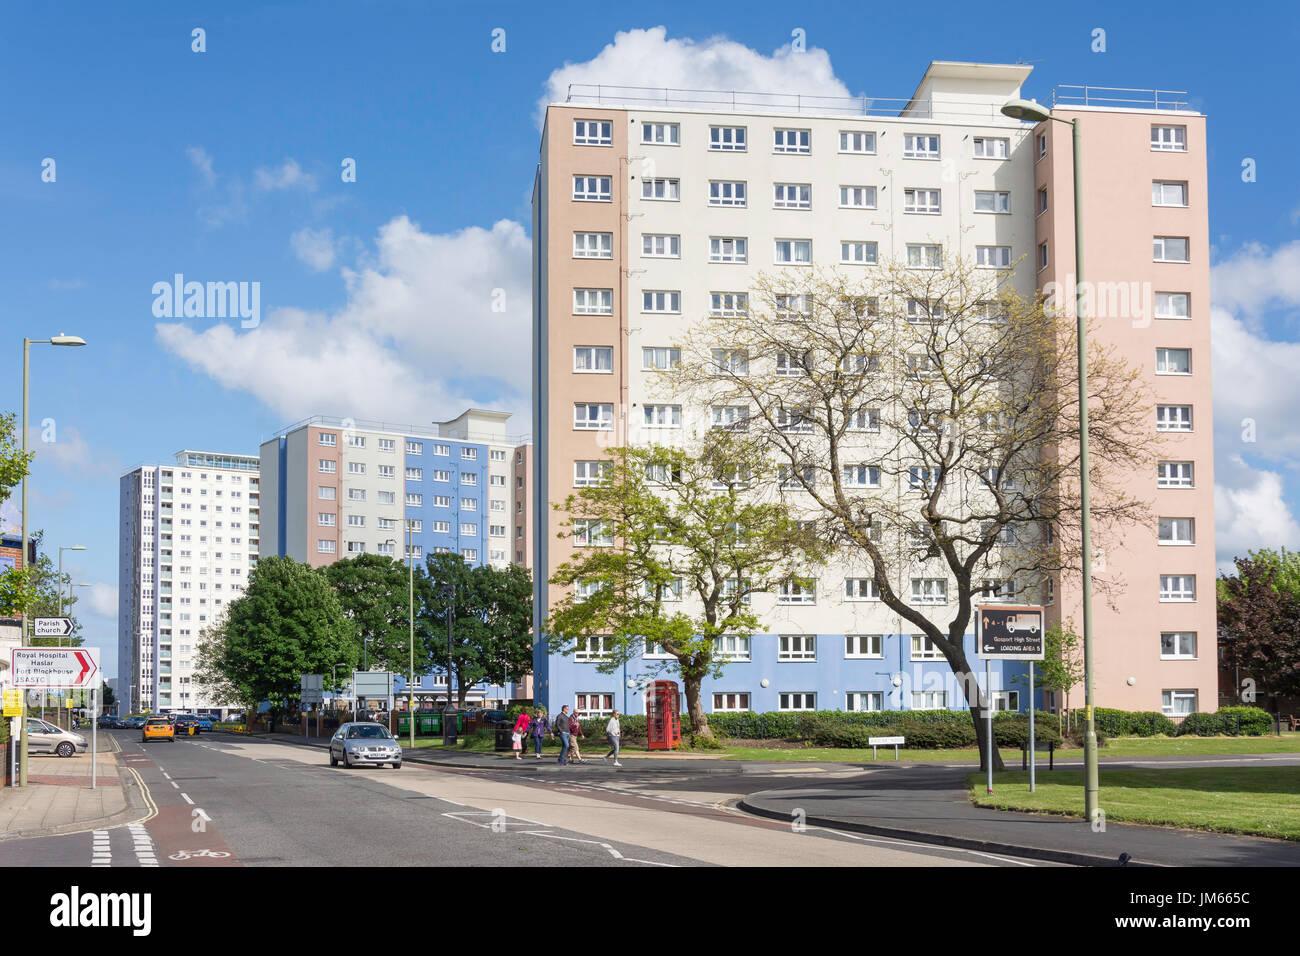 Wohnhochhäusern, Südstraße, Gosport, Hampshire, England, Vereinigtes Königreich Stockbild